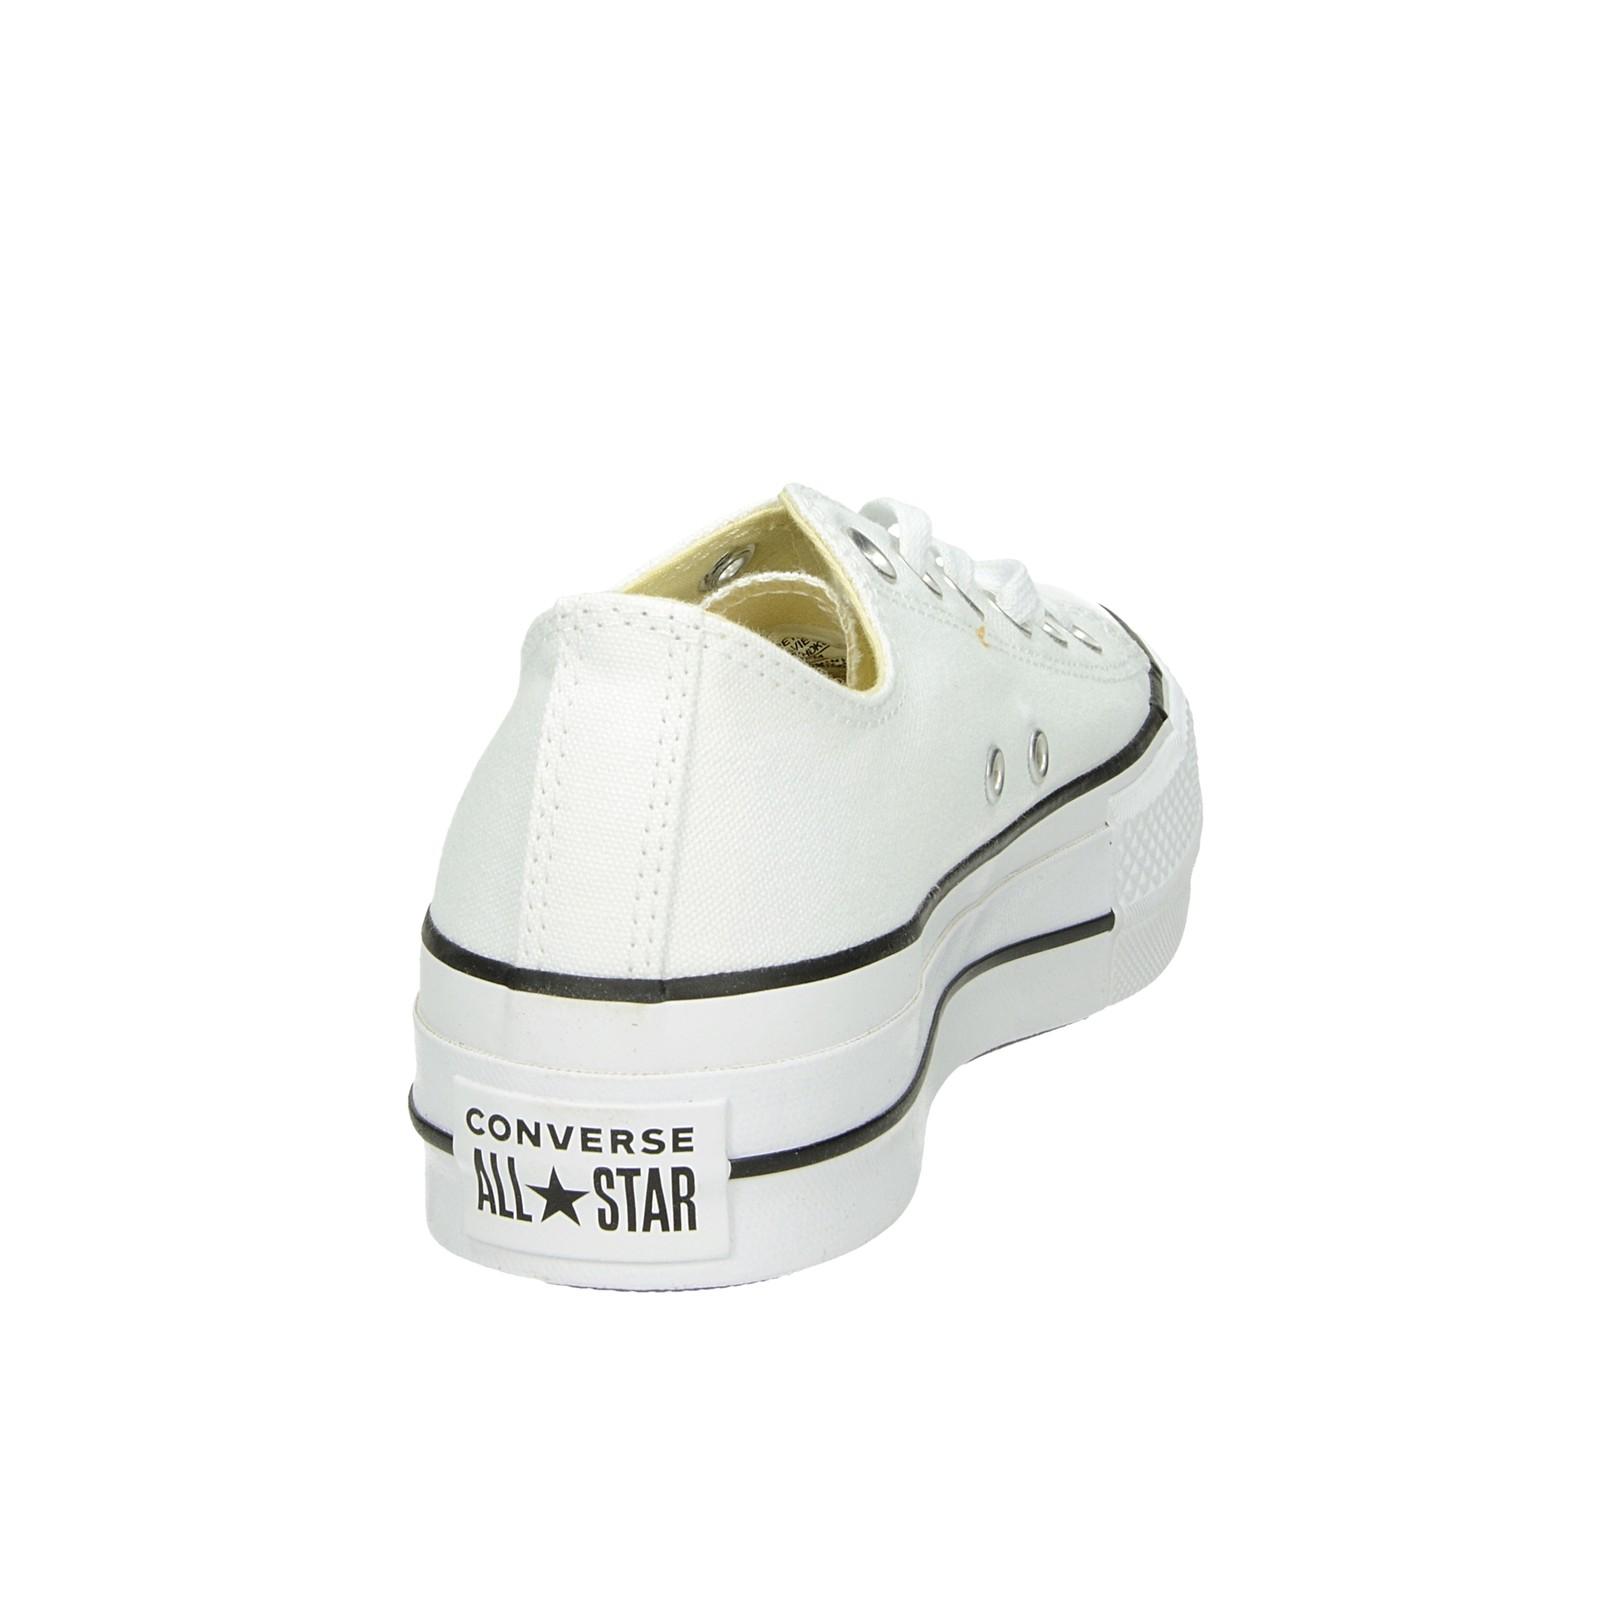 f67bdcd6ceecf Converse dámske štýlové tenisky na platforme - biele | C560251-WHT ...